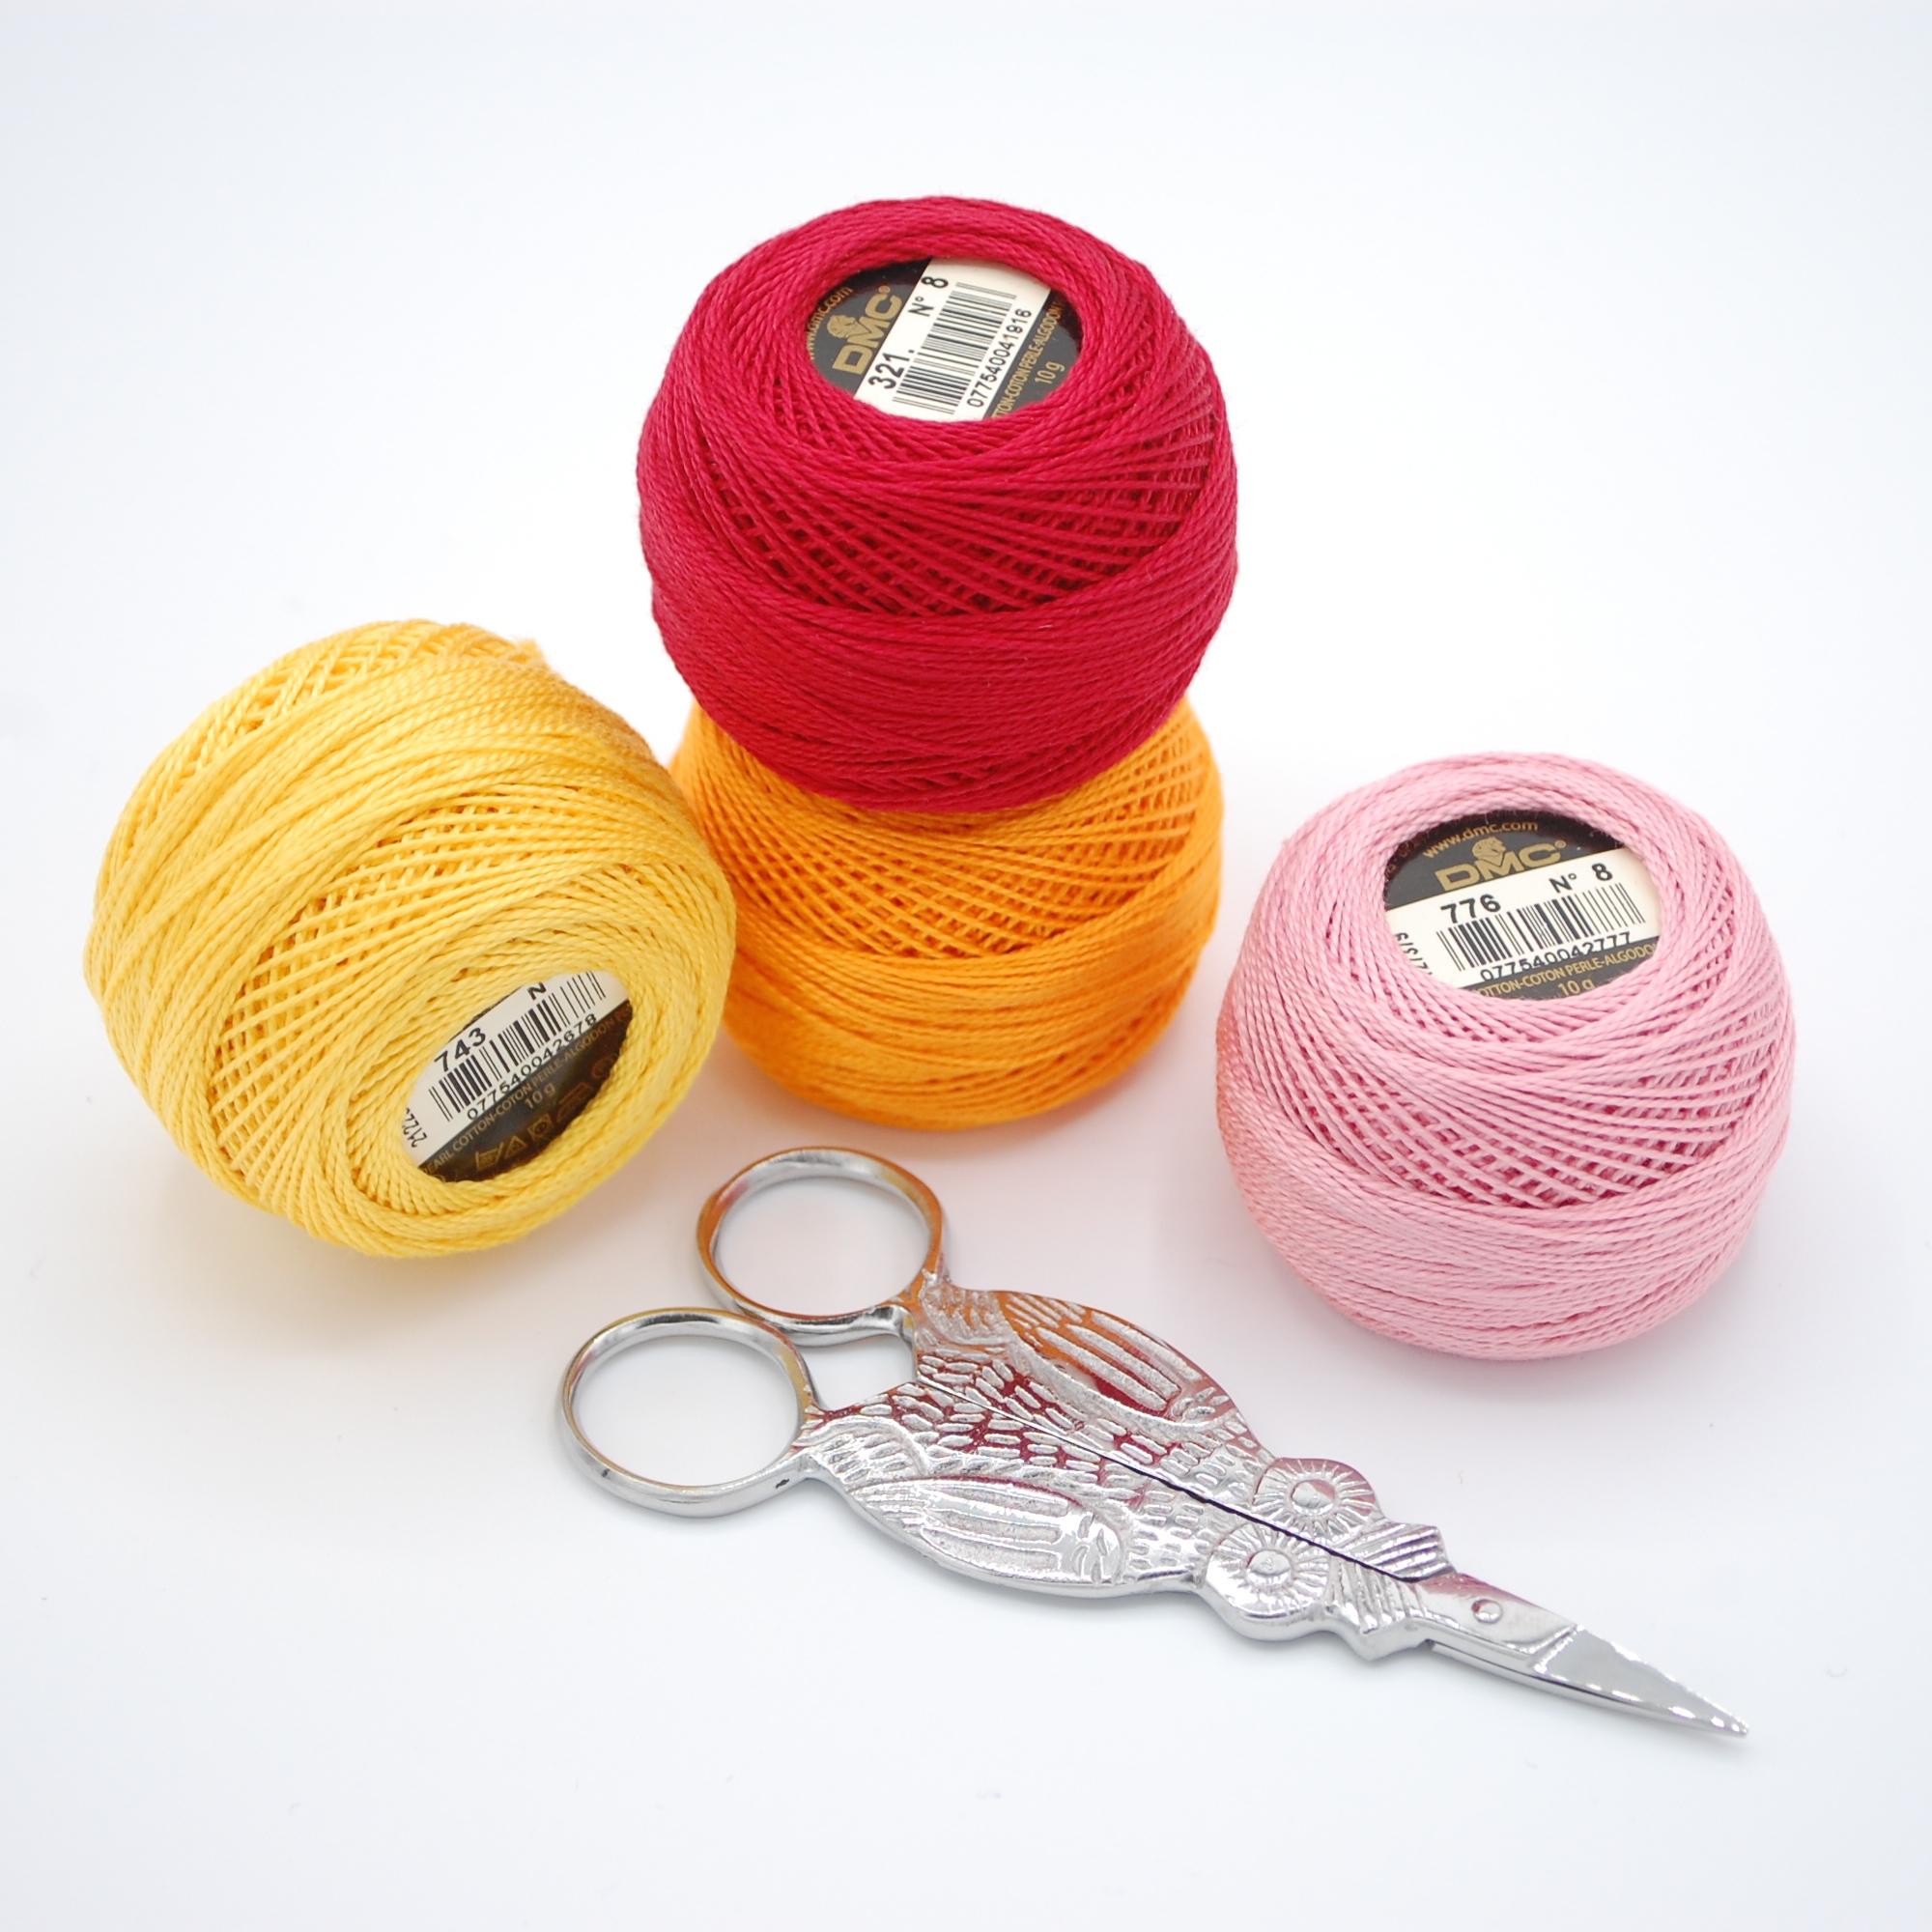 Perle cotton and scissors